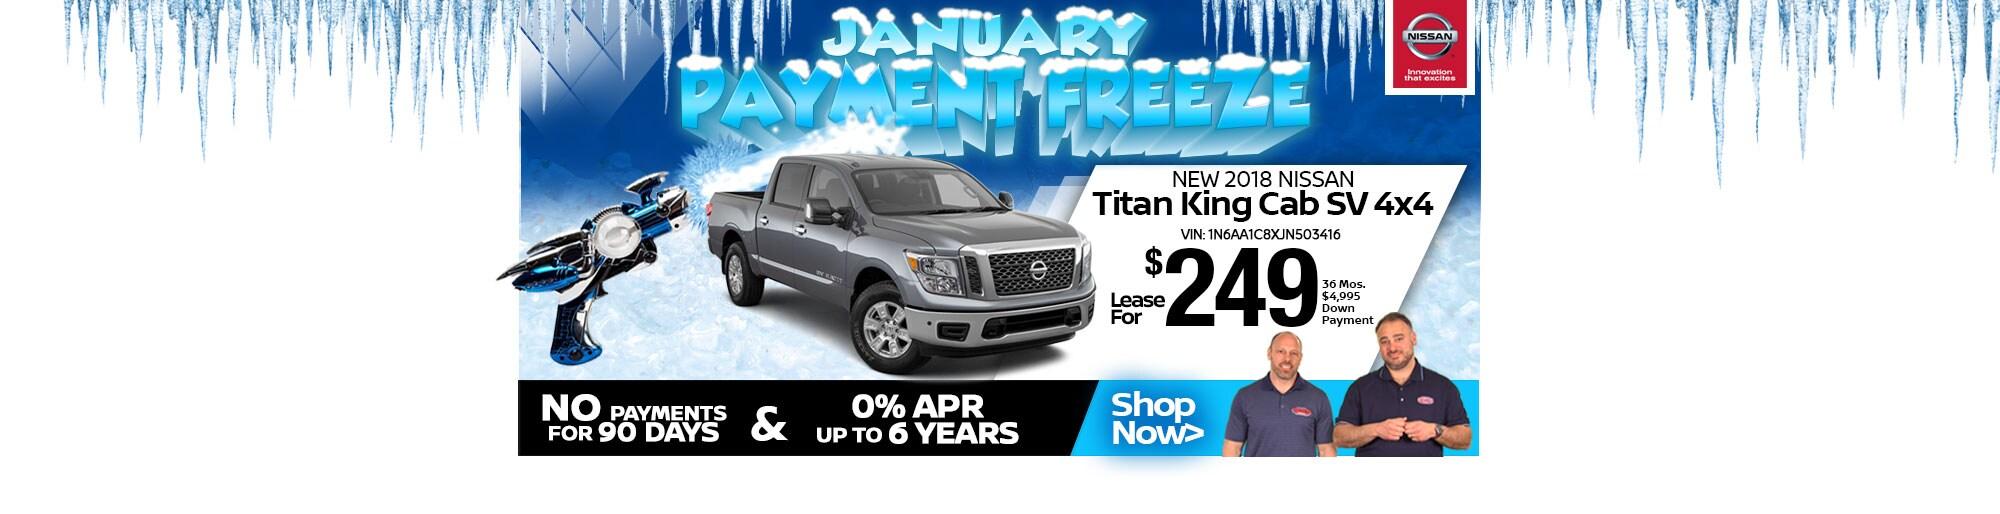 New & Used Nissan Dealer